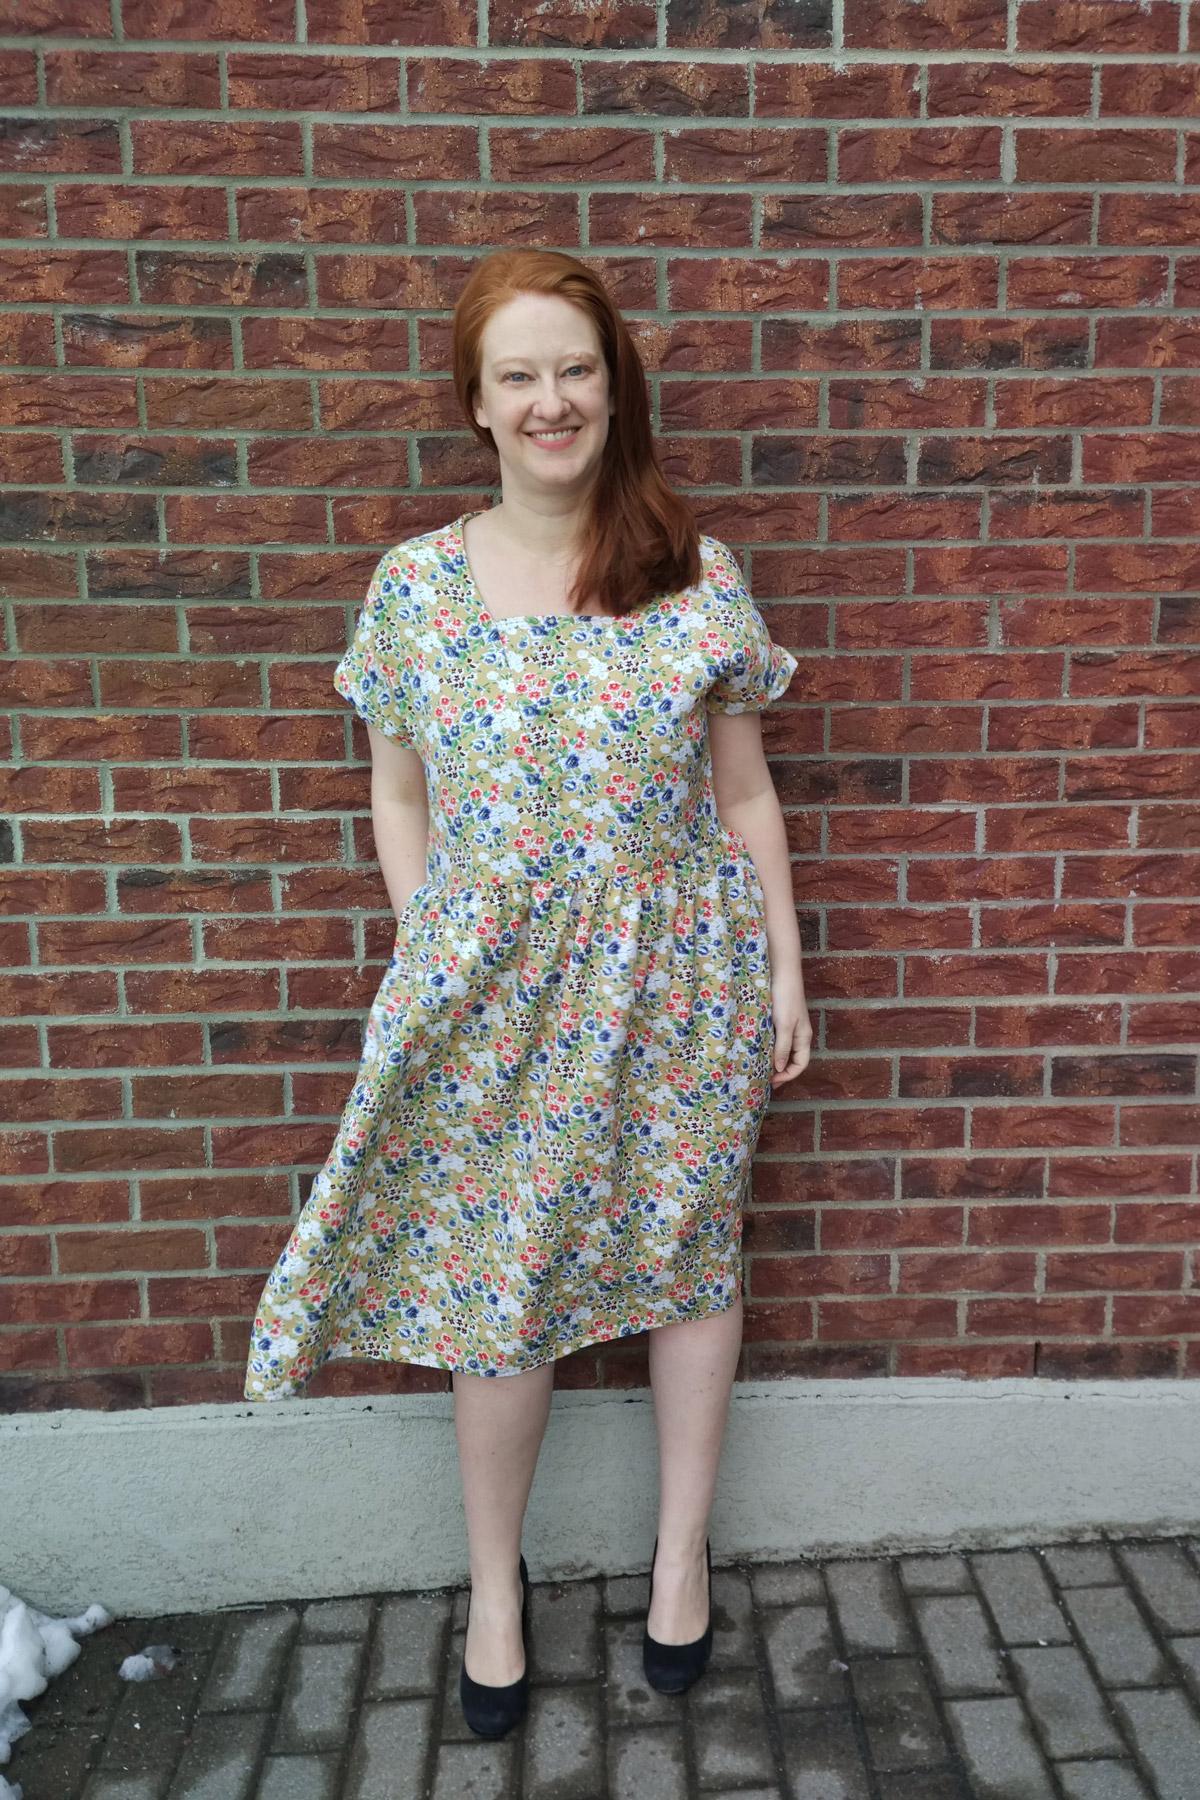 Jenni's Olive dress